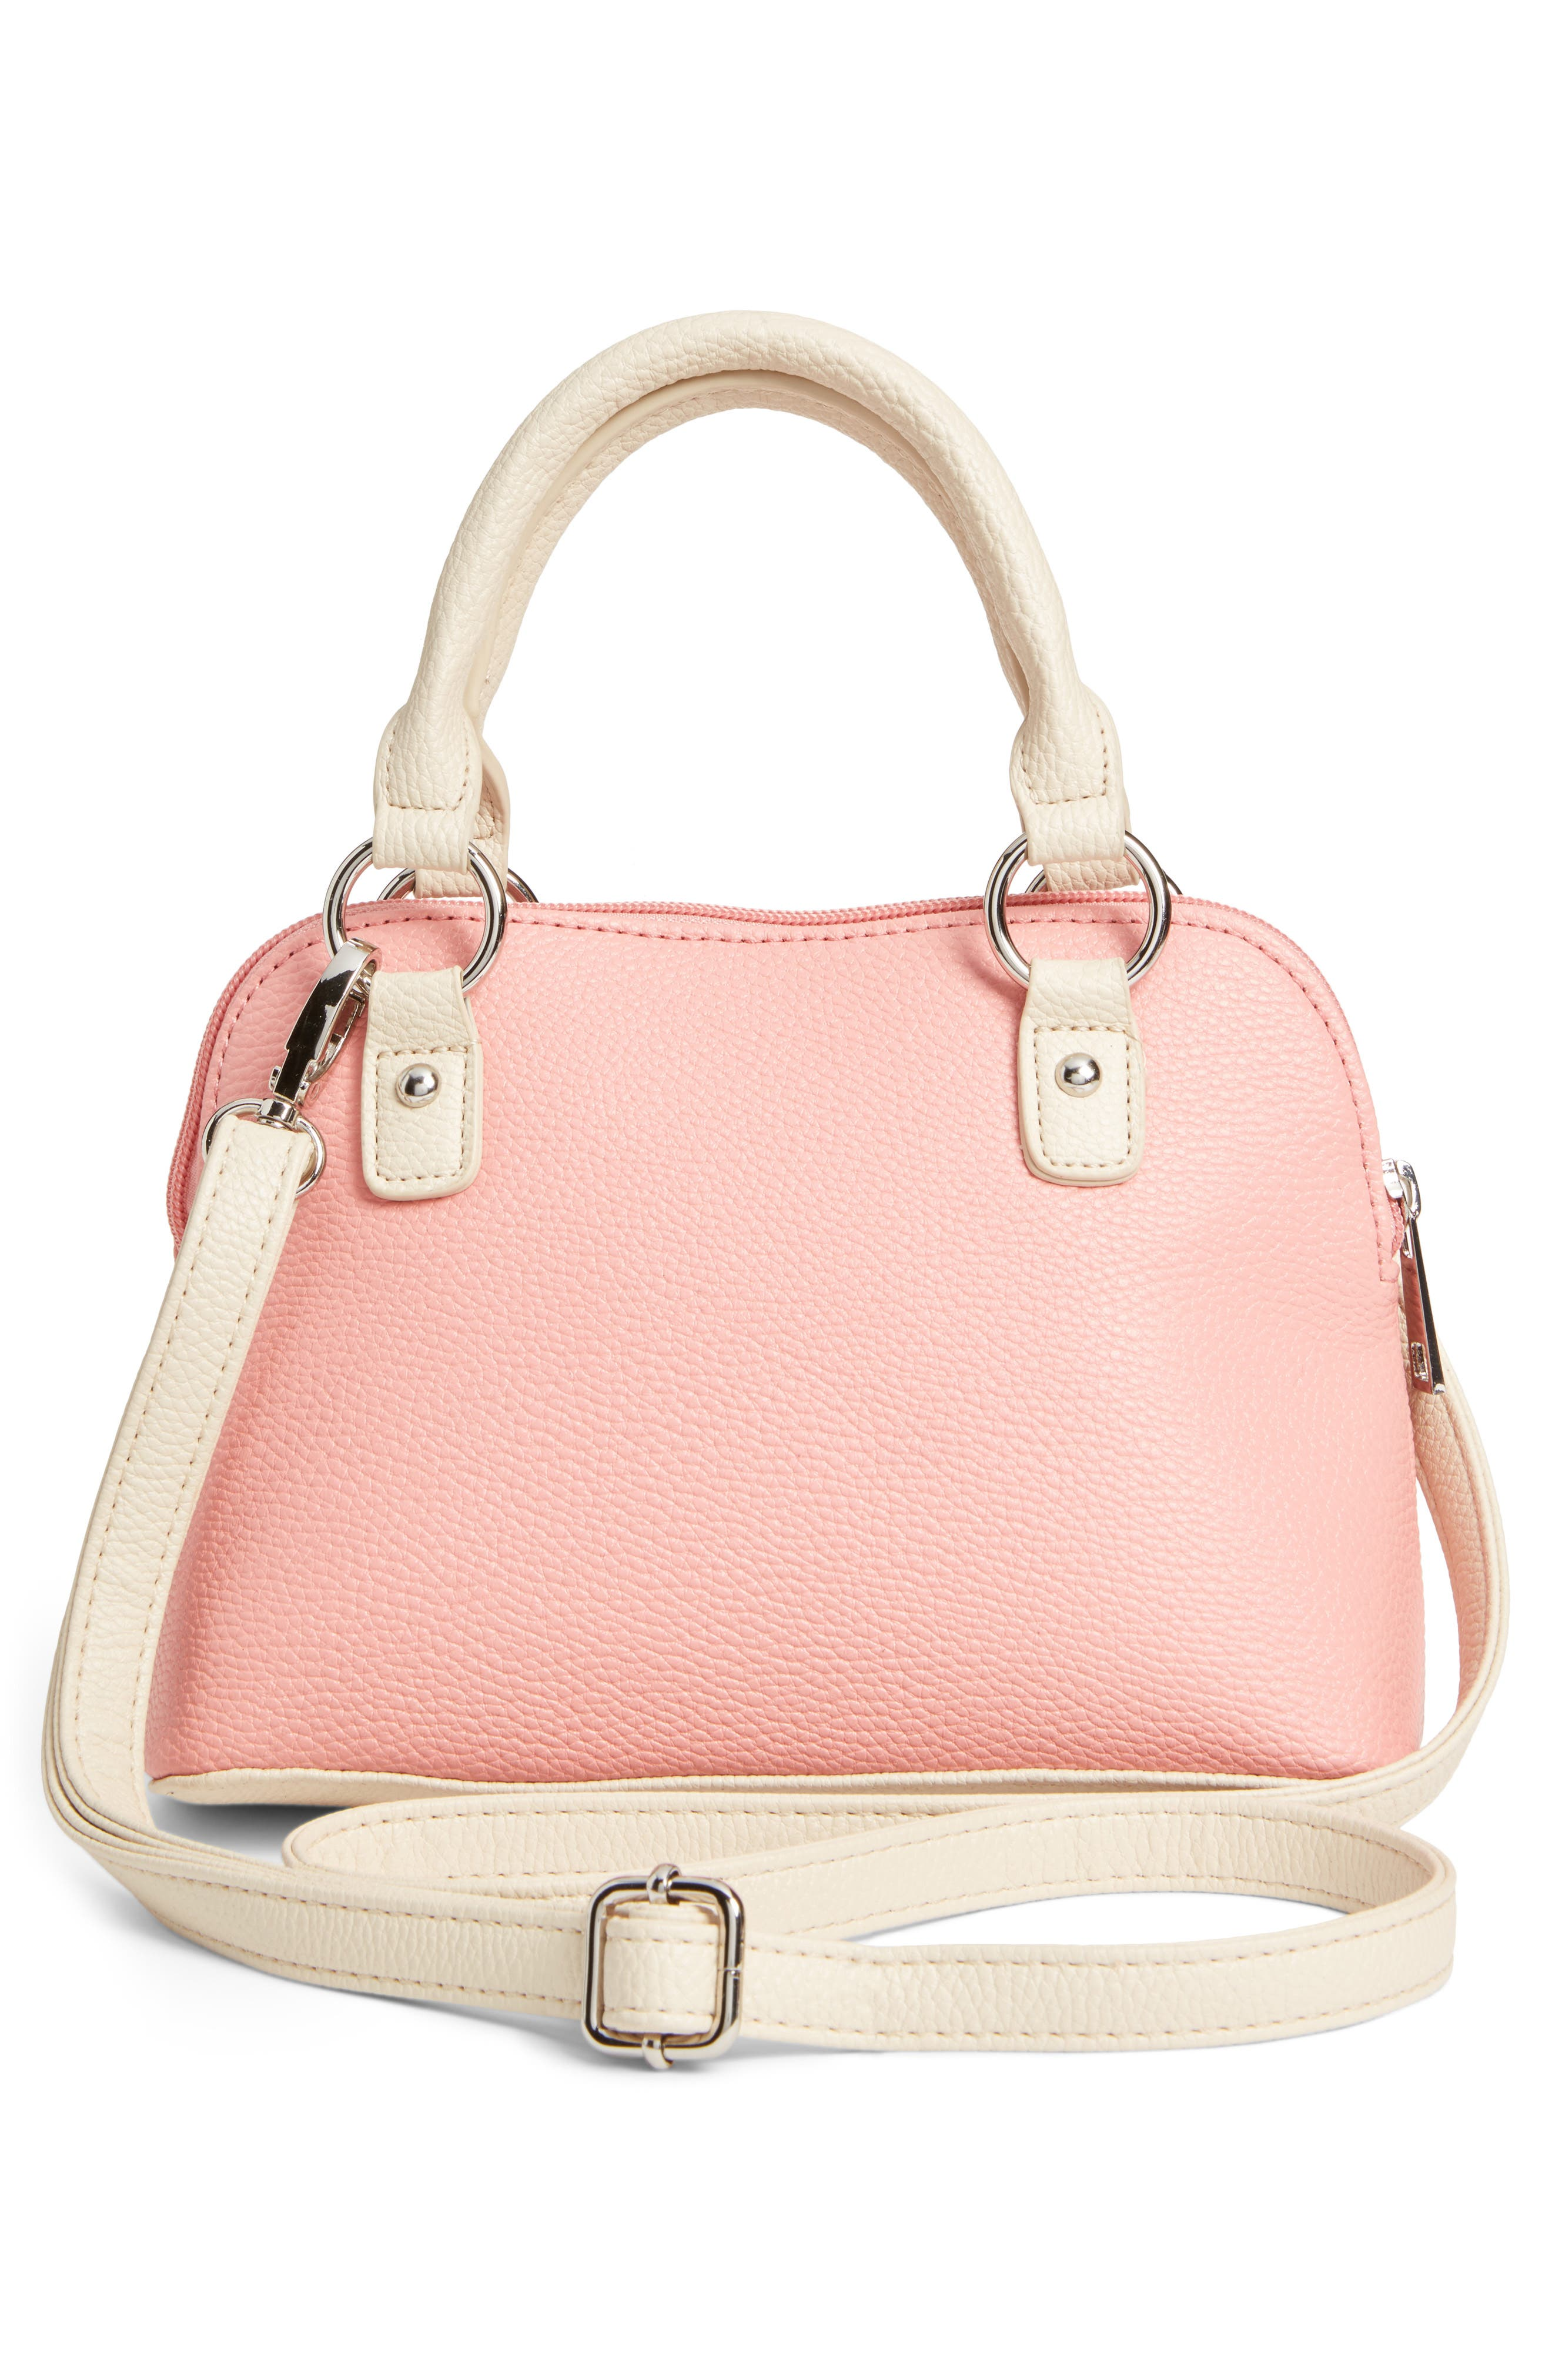 Embroidered Handbag,                             Alternate thumbnail 2, color,                             Pink